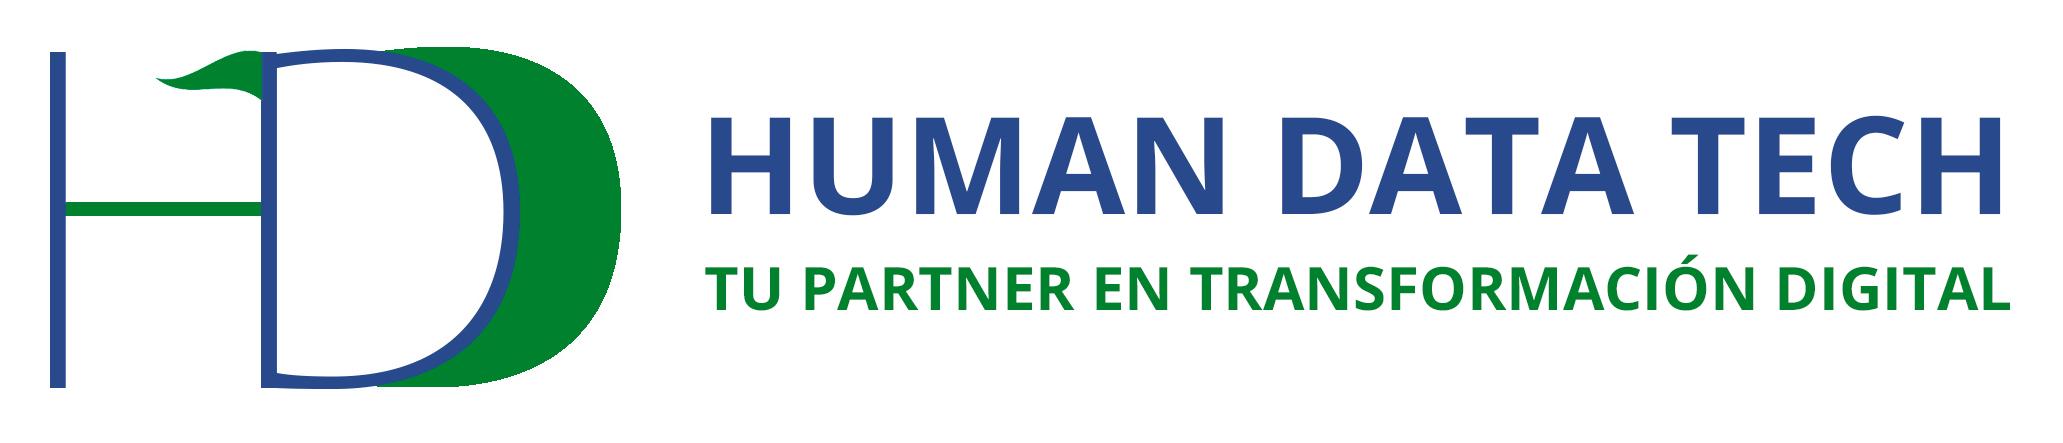 Human Data Tech